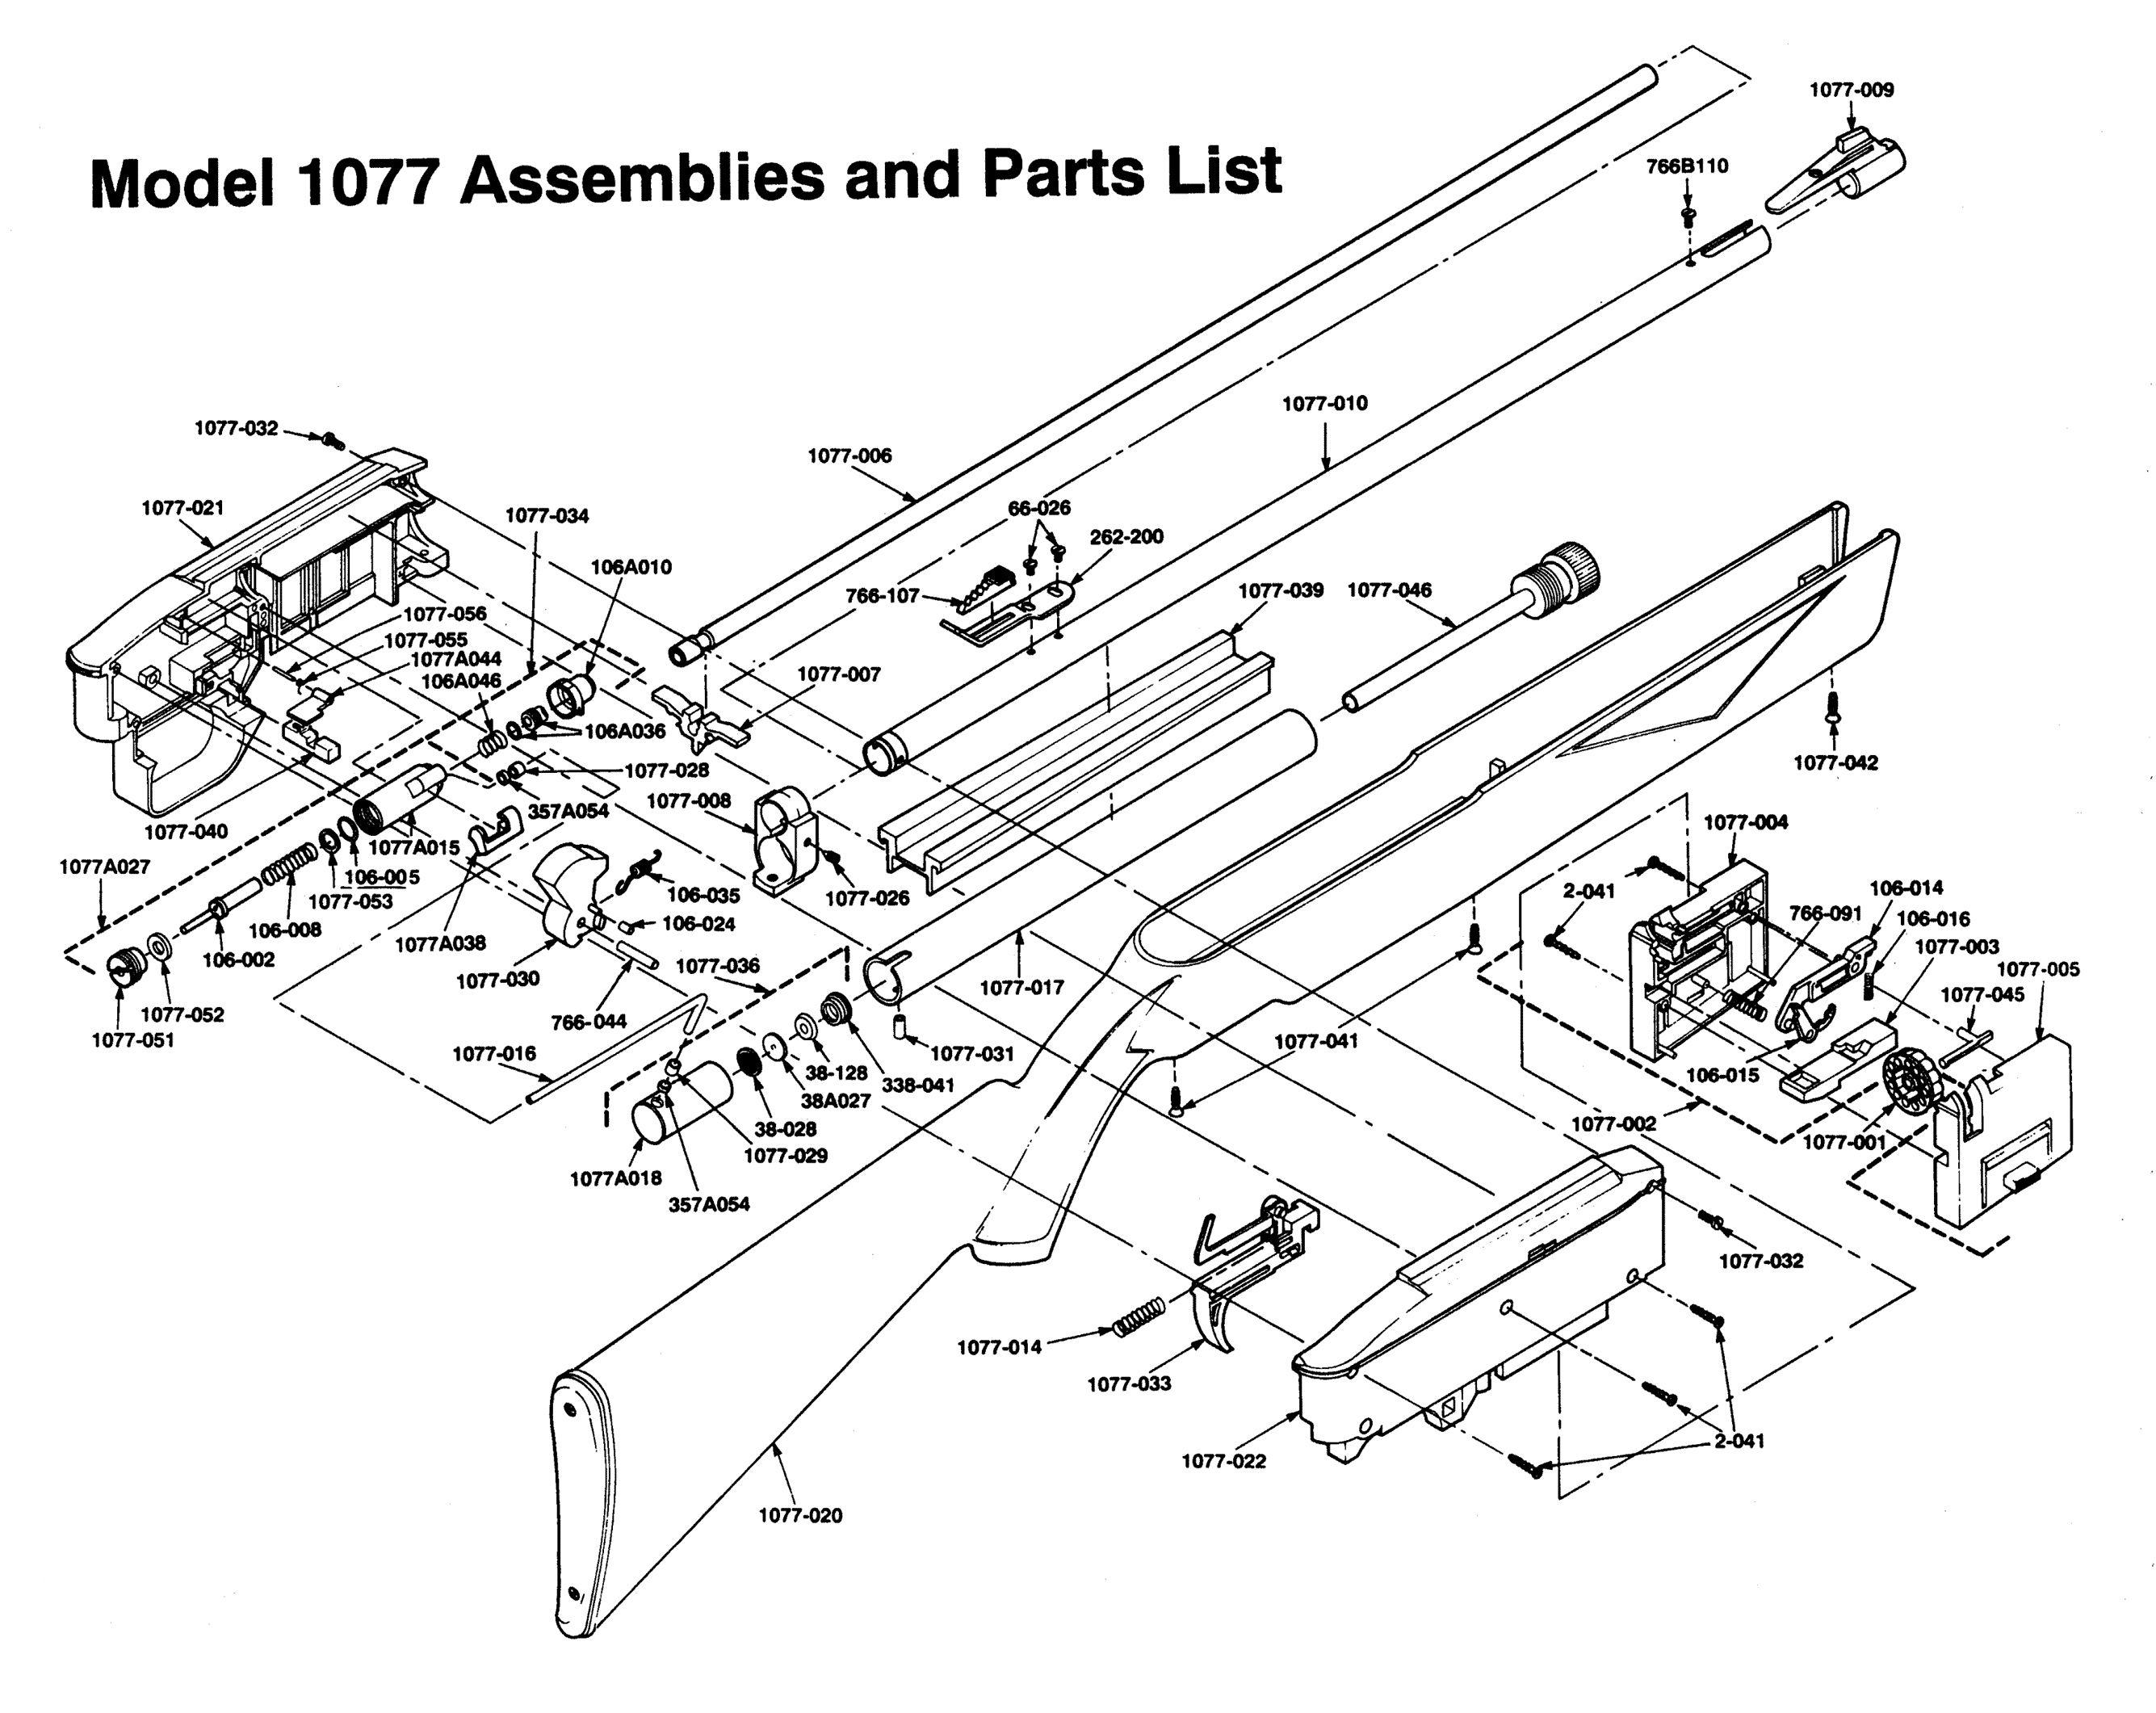 Crosman Model Assemblies And Parts List